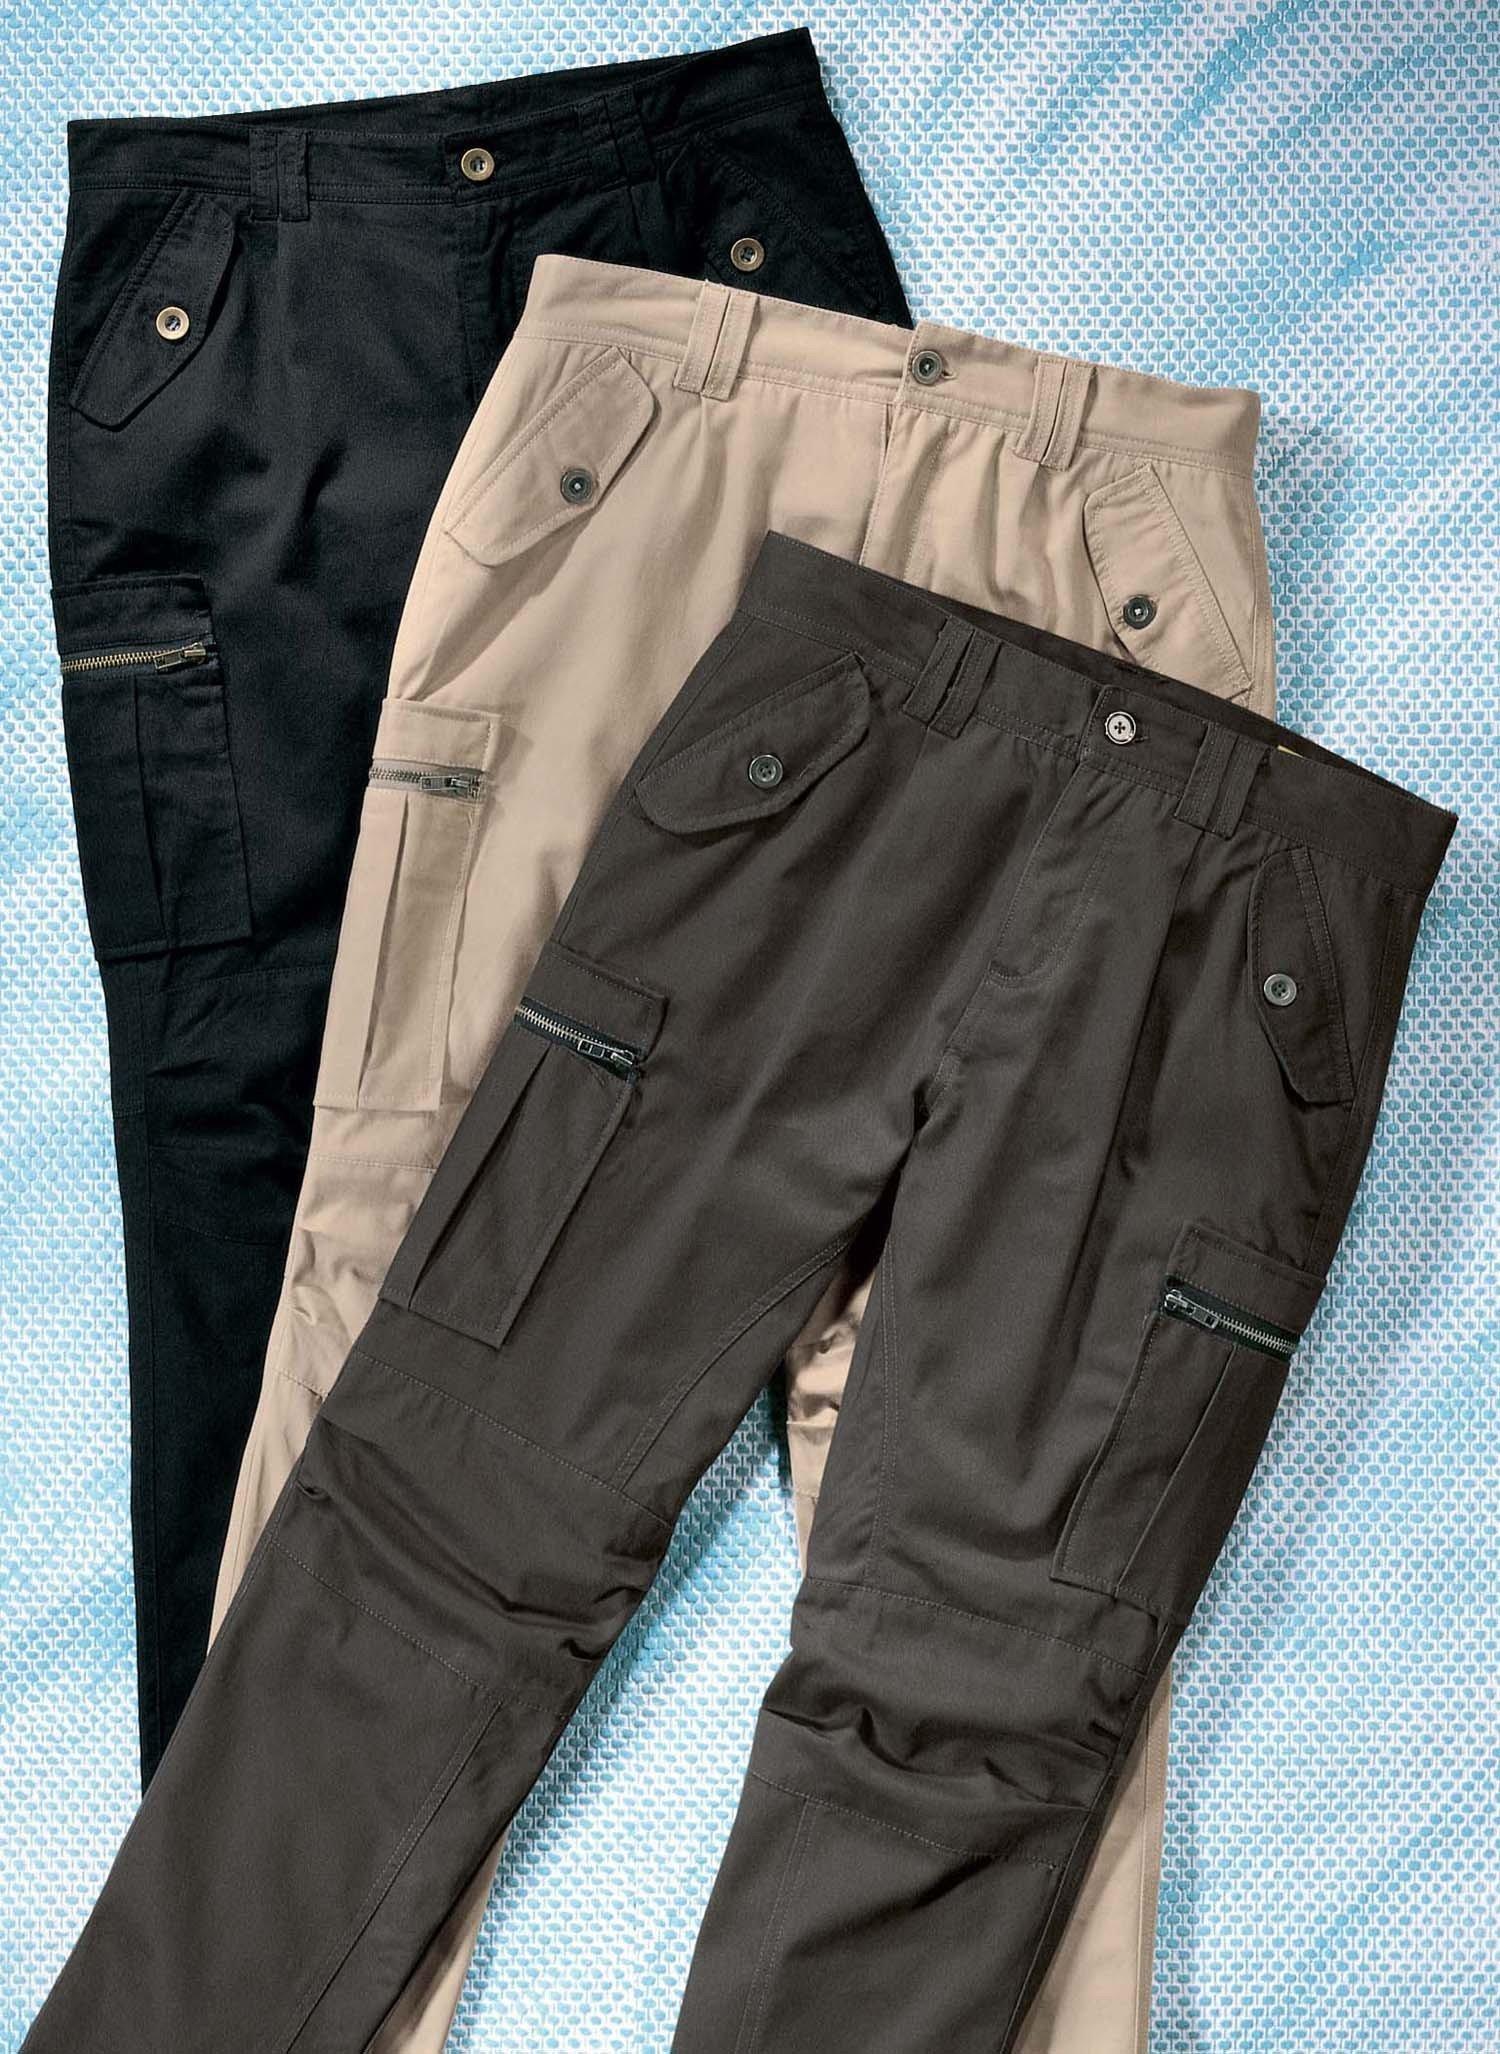 D-Outdoor-Hose,Taschen beige 34 008 - 2 - Ronja.ch